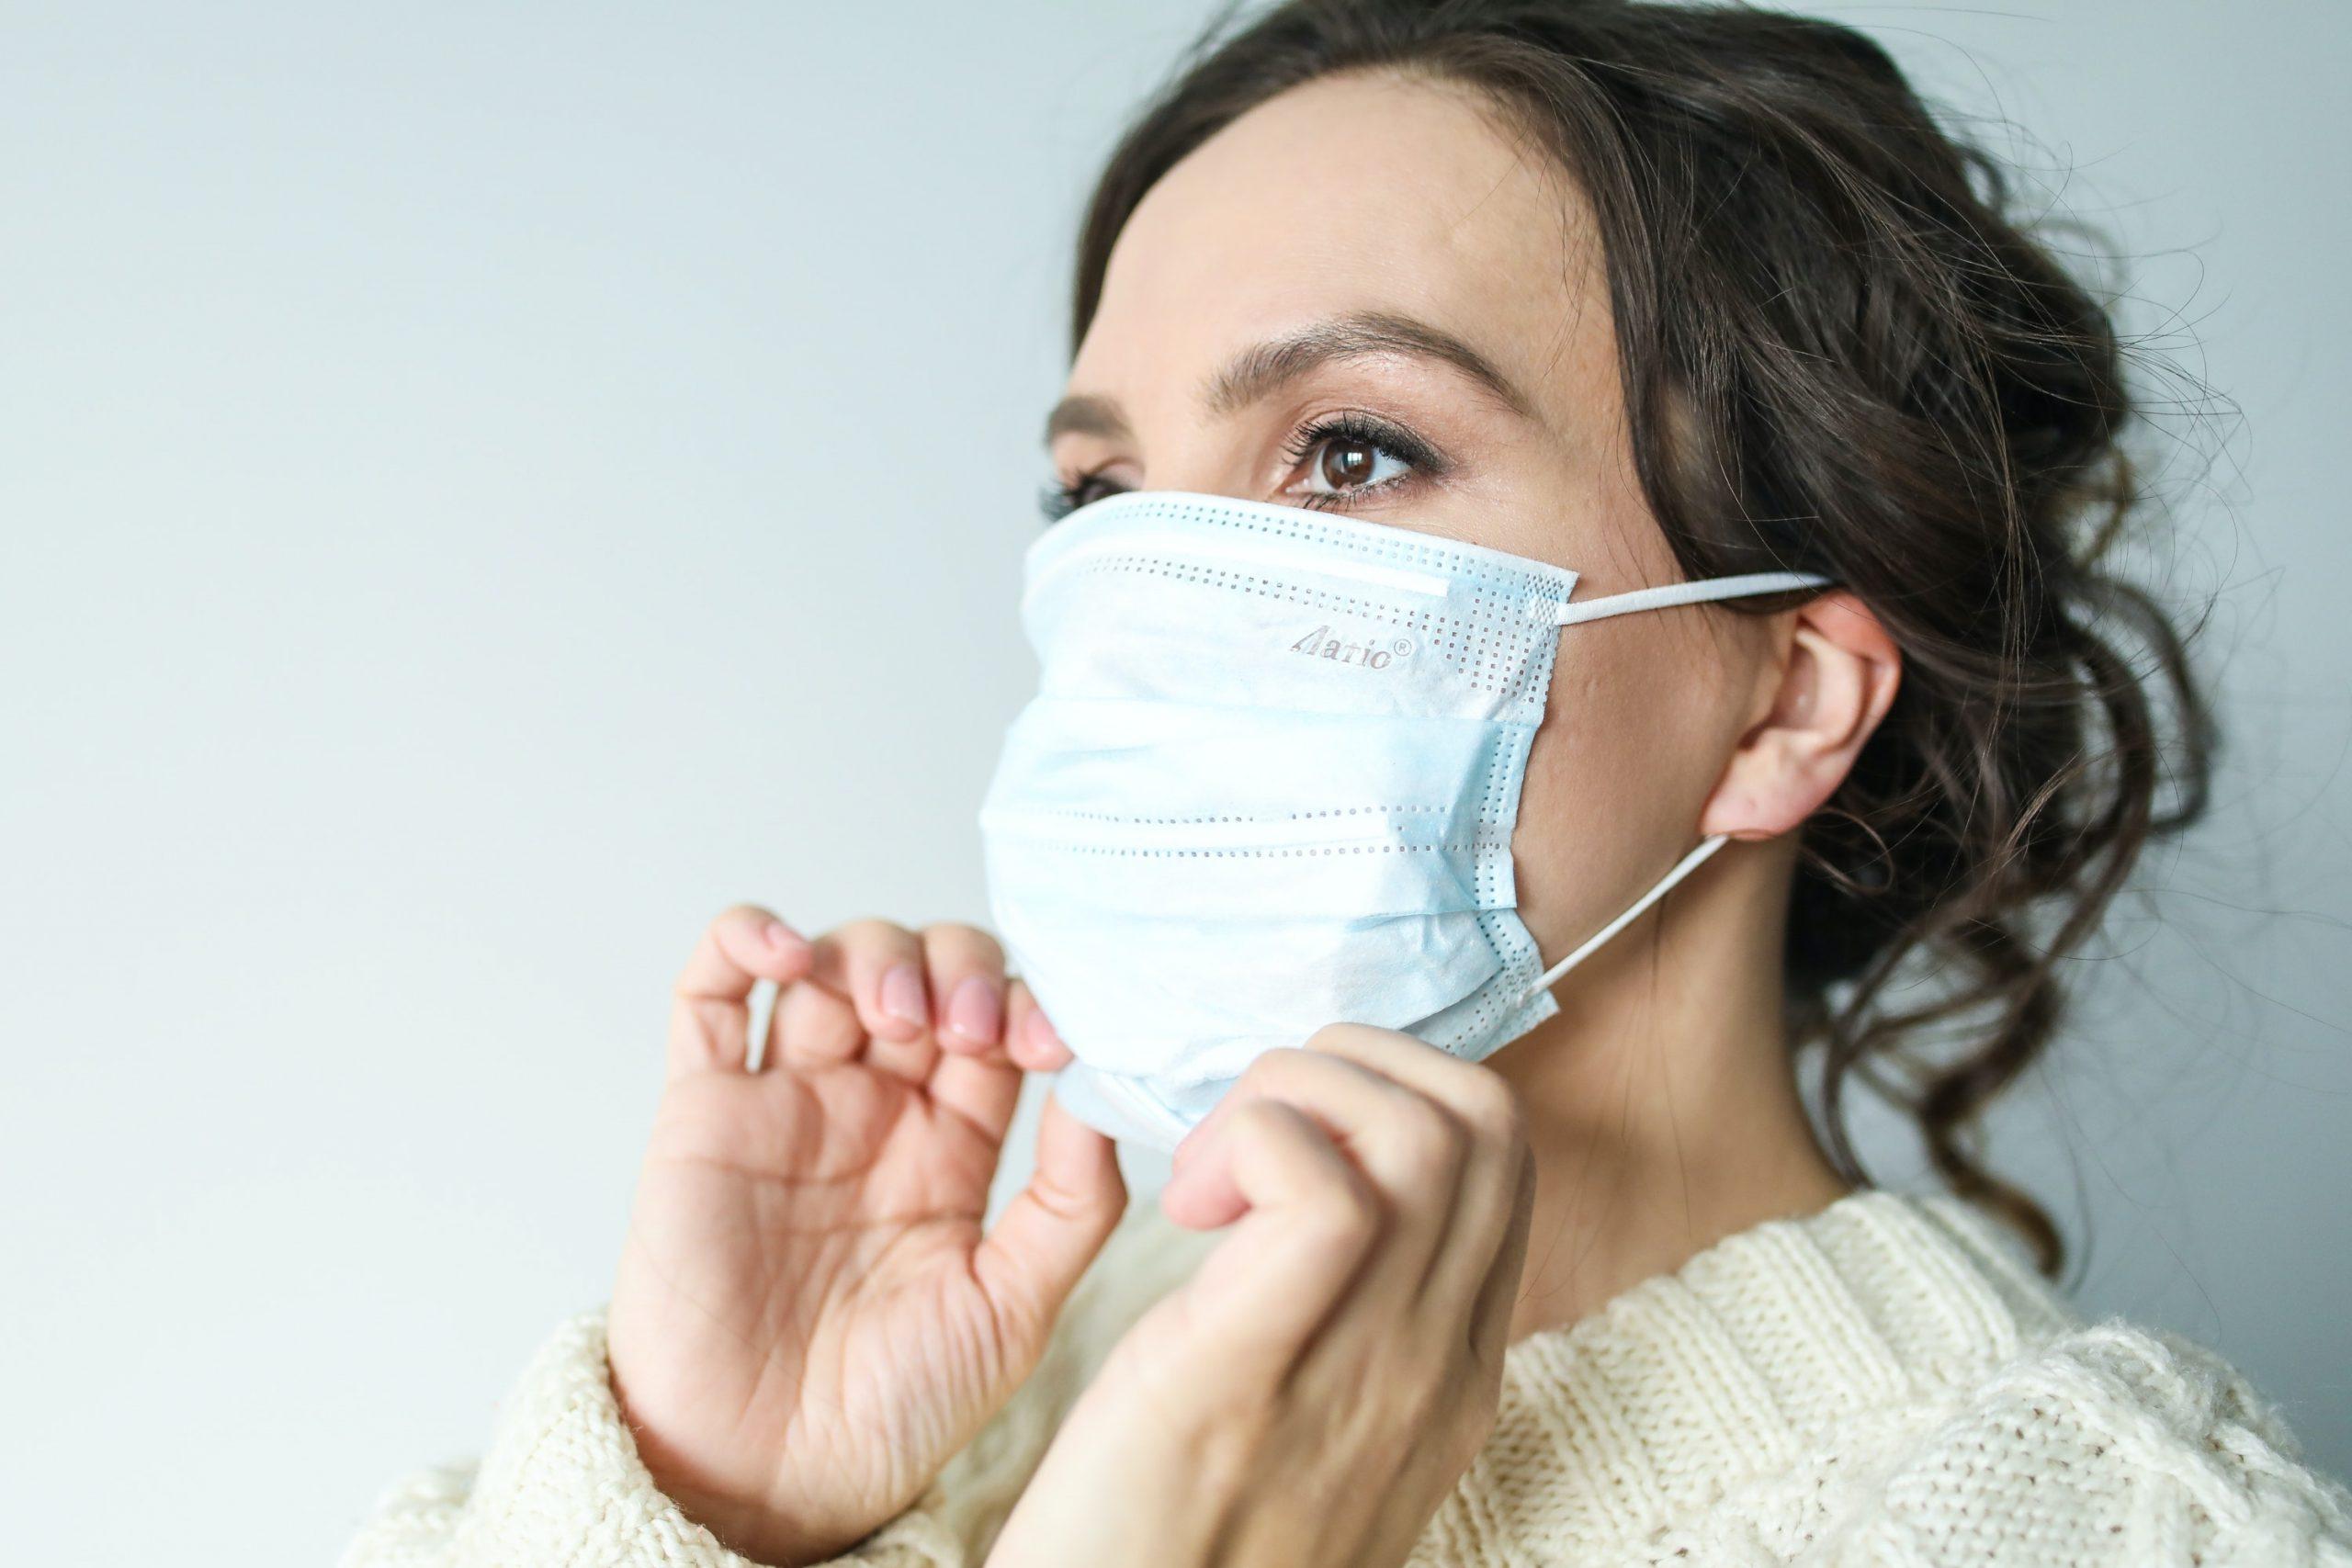 Woman adjusts mask.